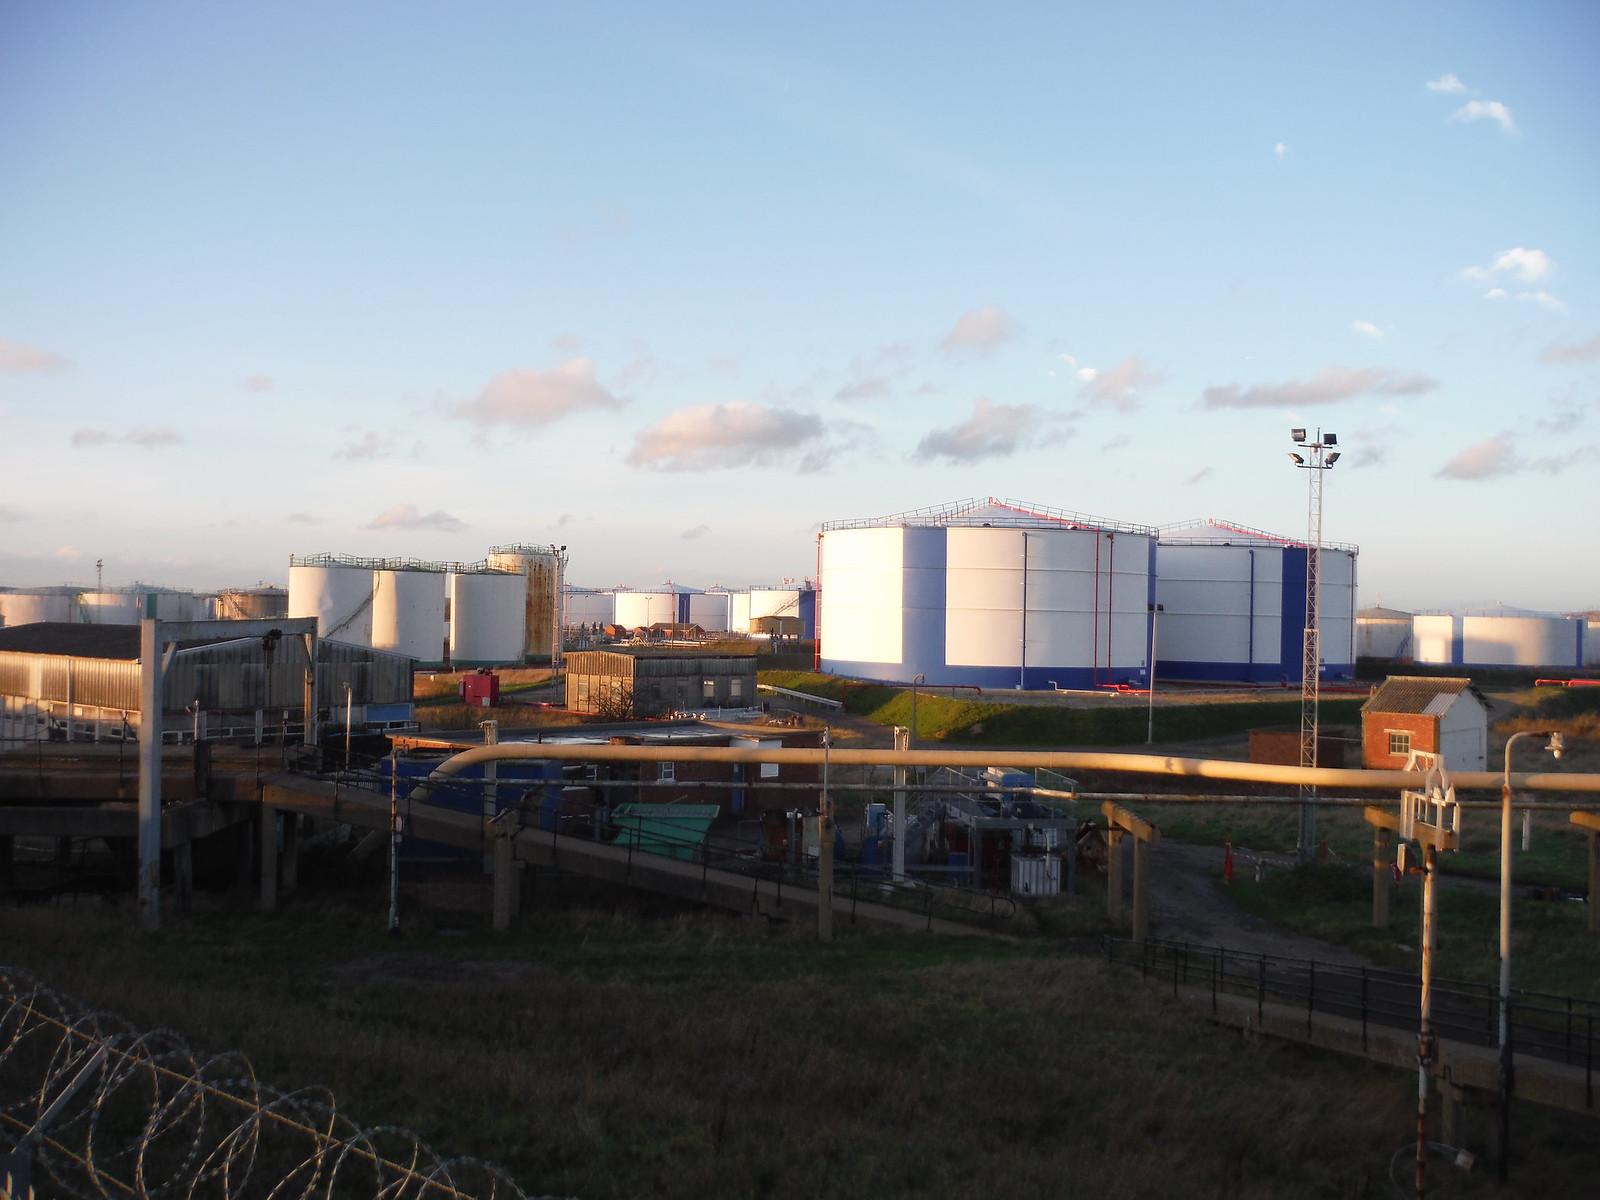 Oikos Oil Product Terminal, Canvey Island SWC Walk 258 Benfleet Circular (via Canvey Island)